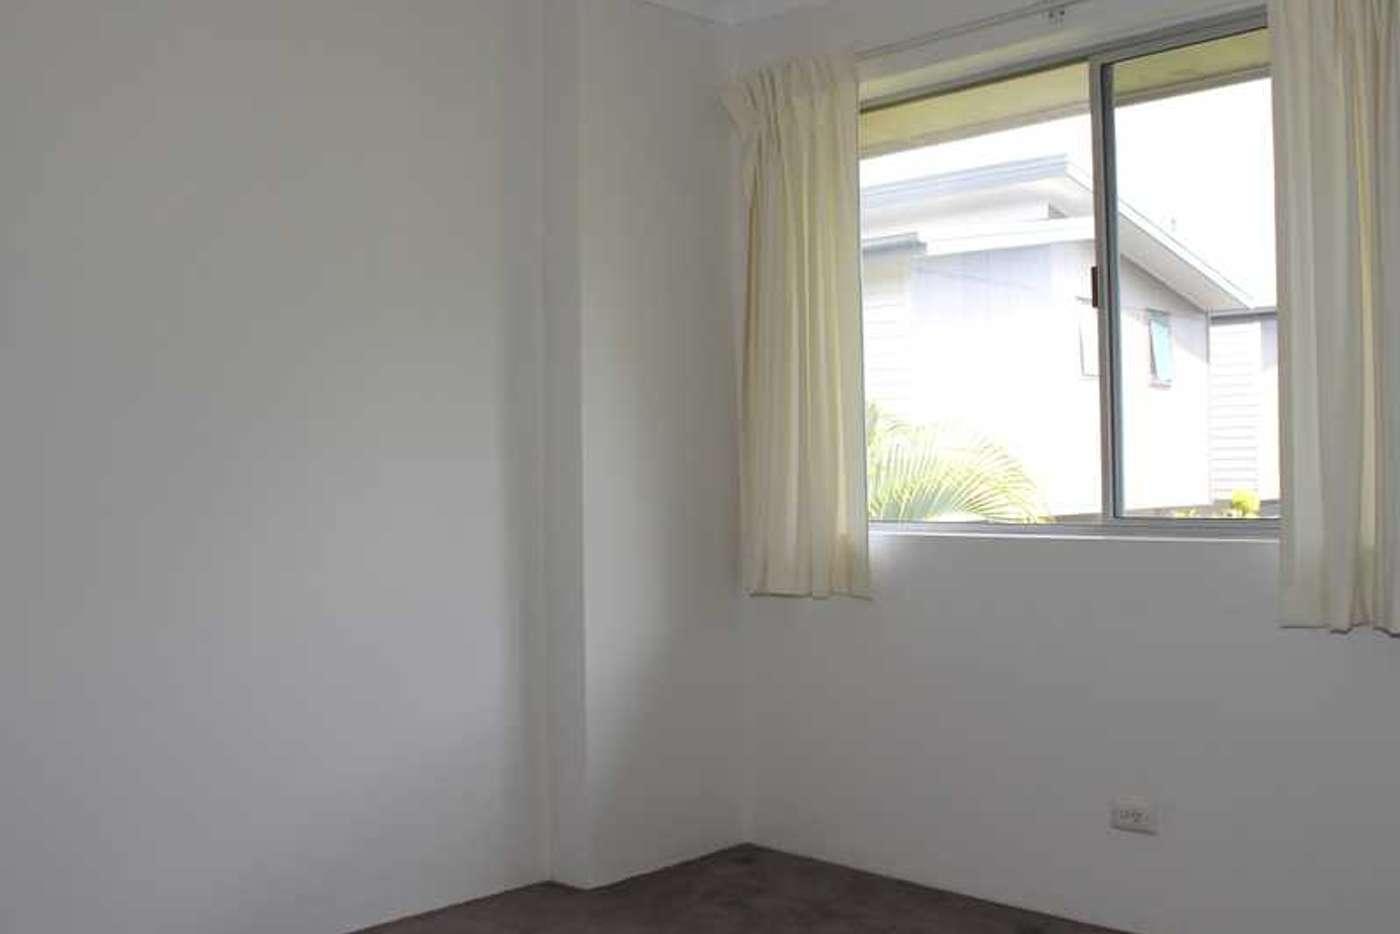 Sixth view of Homely unit listing, Unit 5/38 Kent Street, Hamilton QLD 4007